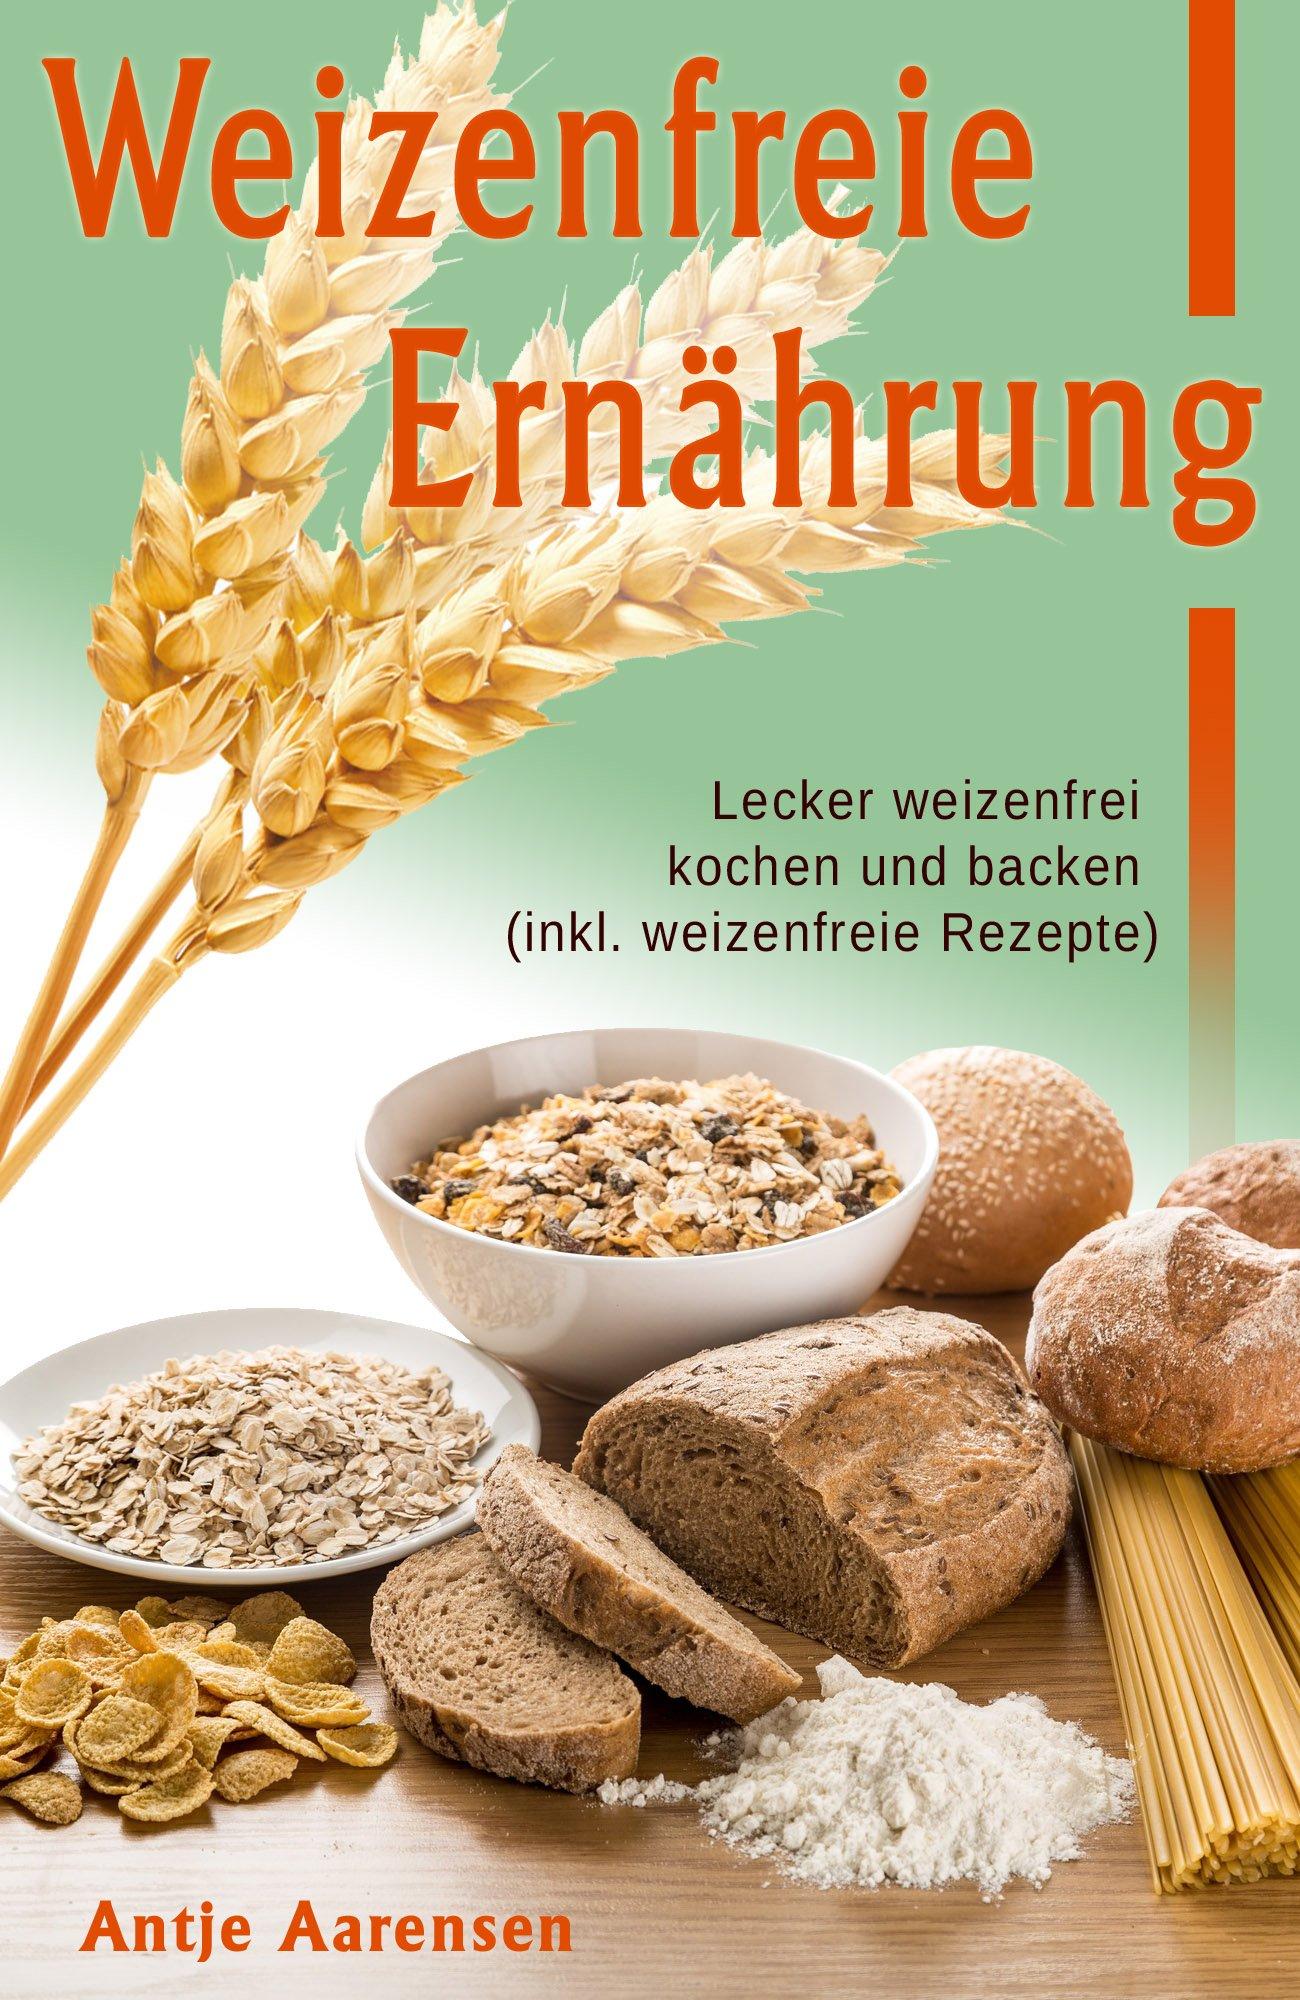 Weizenfreie Ernährung  Lecker Weizenfrei Kochen Und Backen  Inkl. Weizenfreie Rezepte